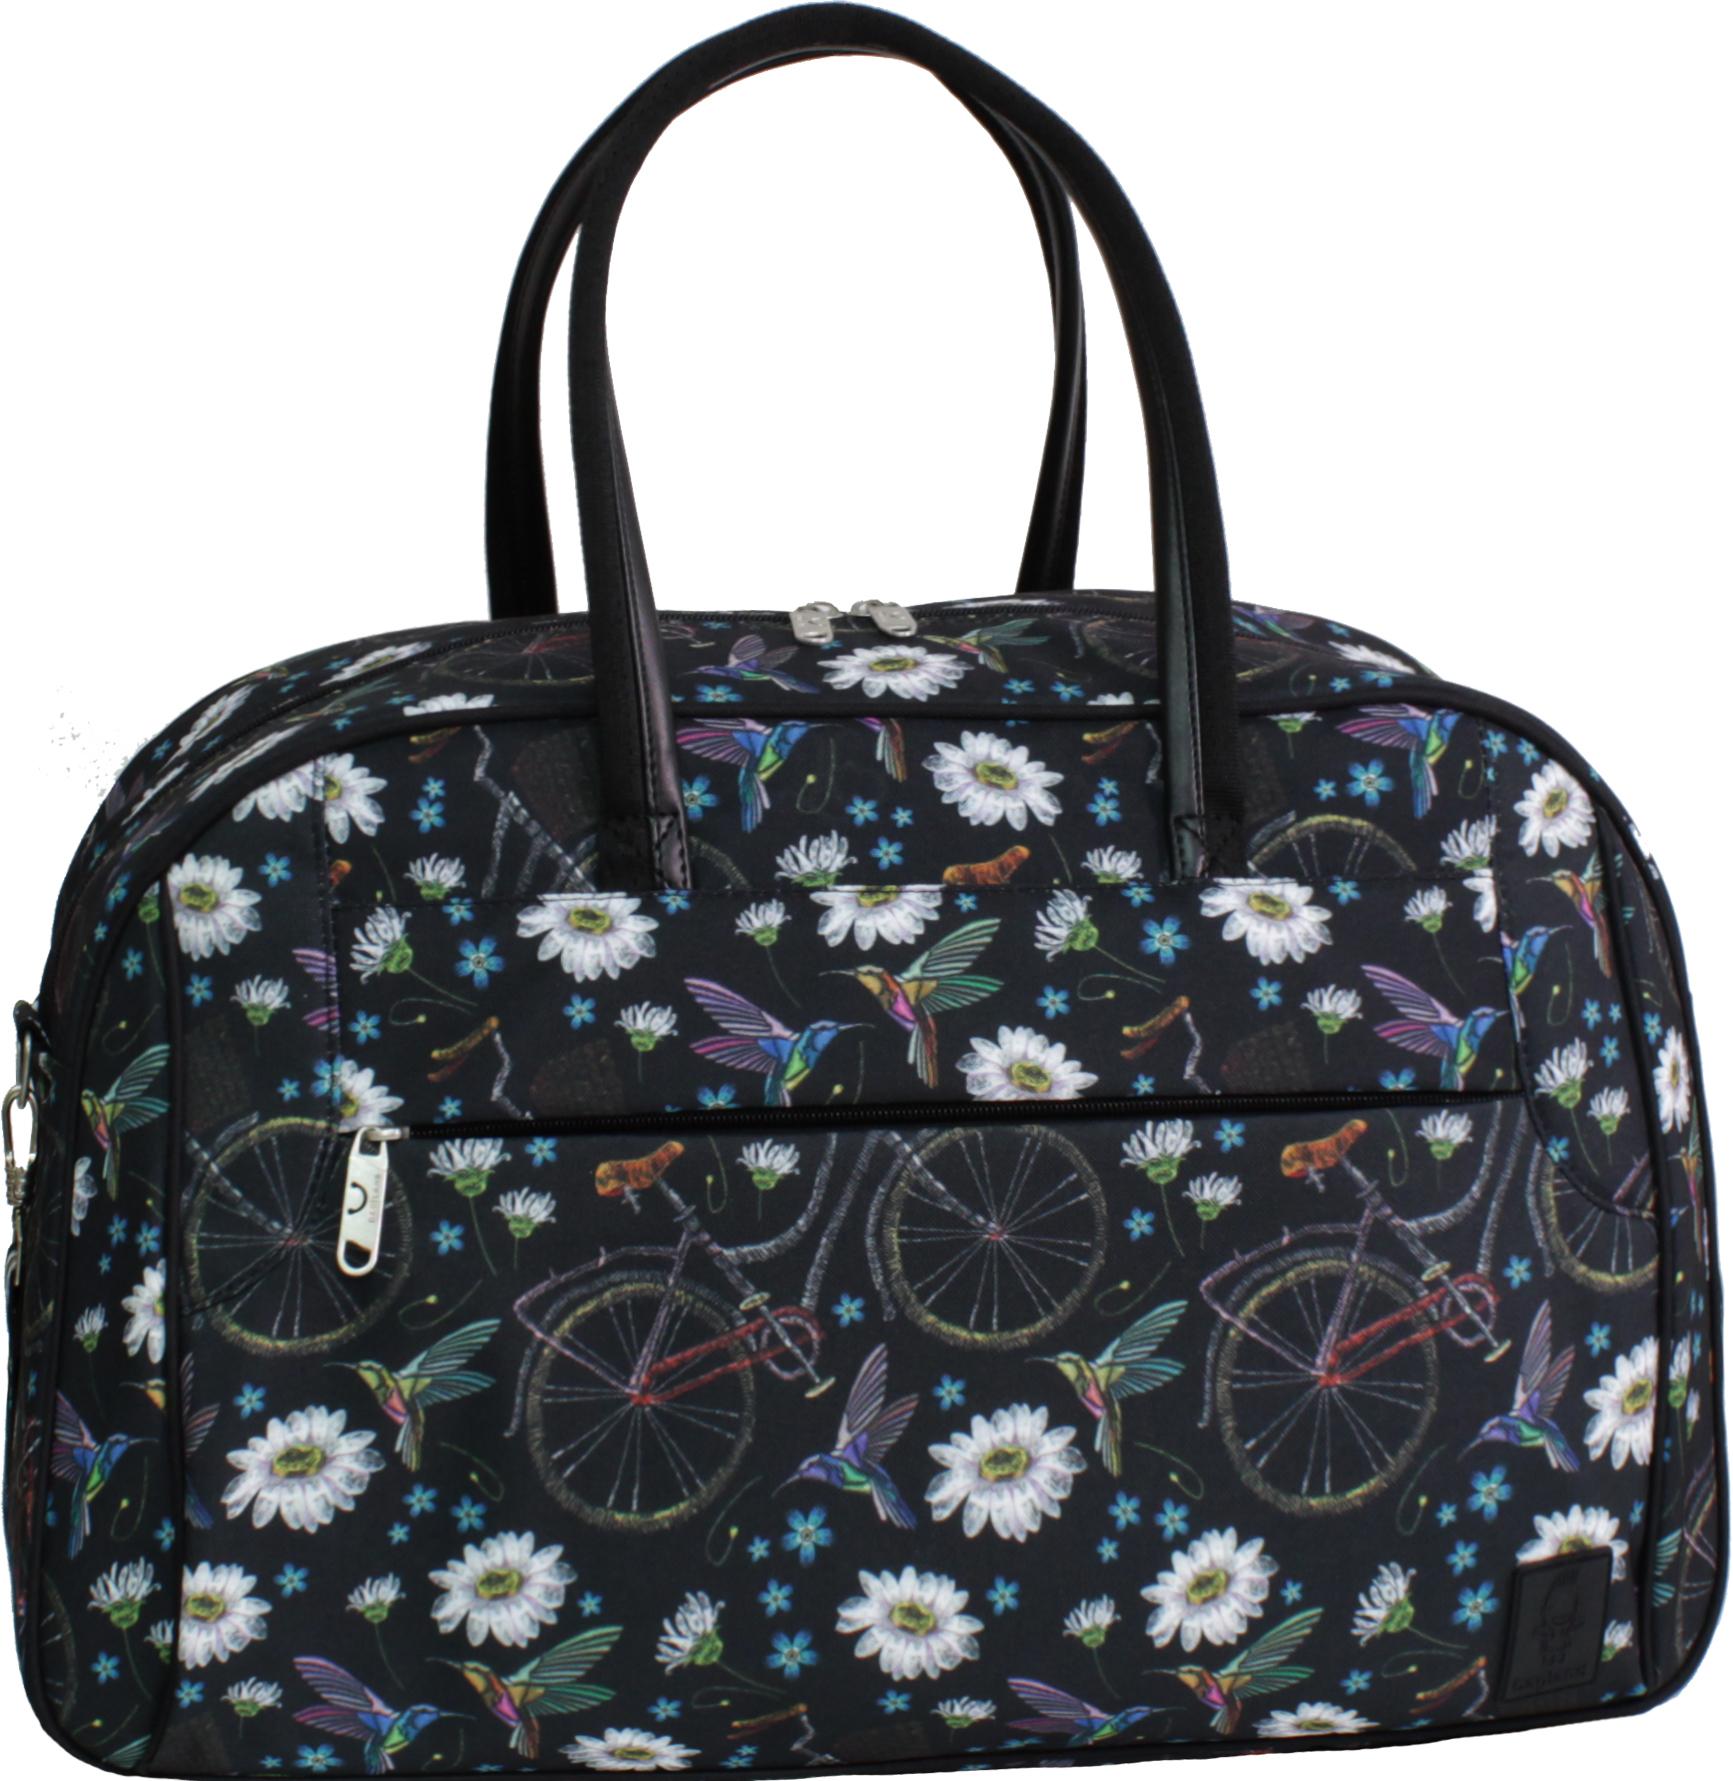 Спортивные сумки Сумка Bagland Тунис 34 л. Сублимация 194 (00390664) IMG_9015.JPG